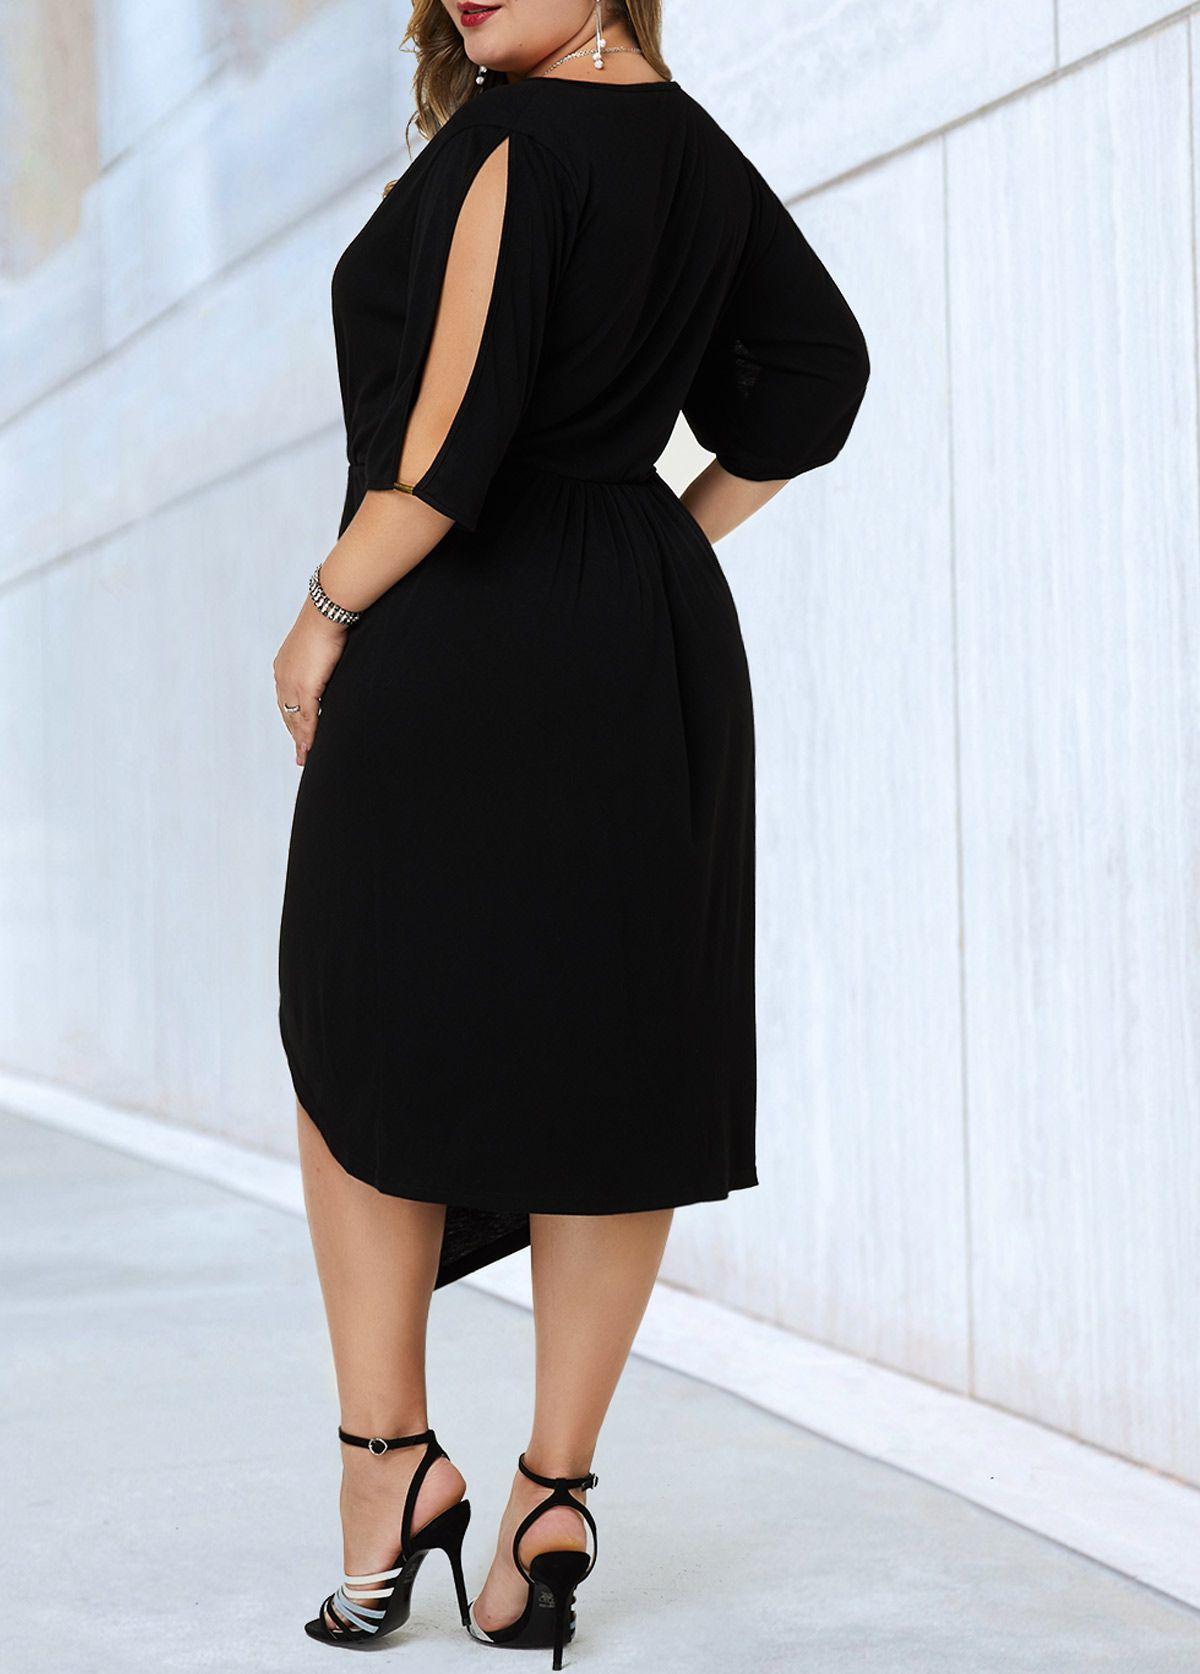 V Neck Split Sleeve Black Plus Size Dress Rotita Com Usd 28 11 Plus Size Black Dresses Black Plus Size Dress Plus Size Outfits [ 1674 x 1200 Pixel ]